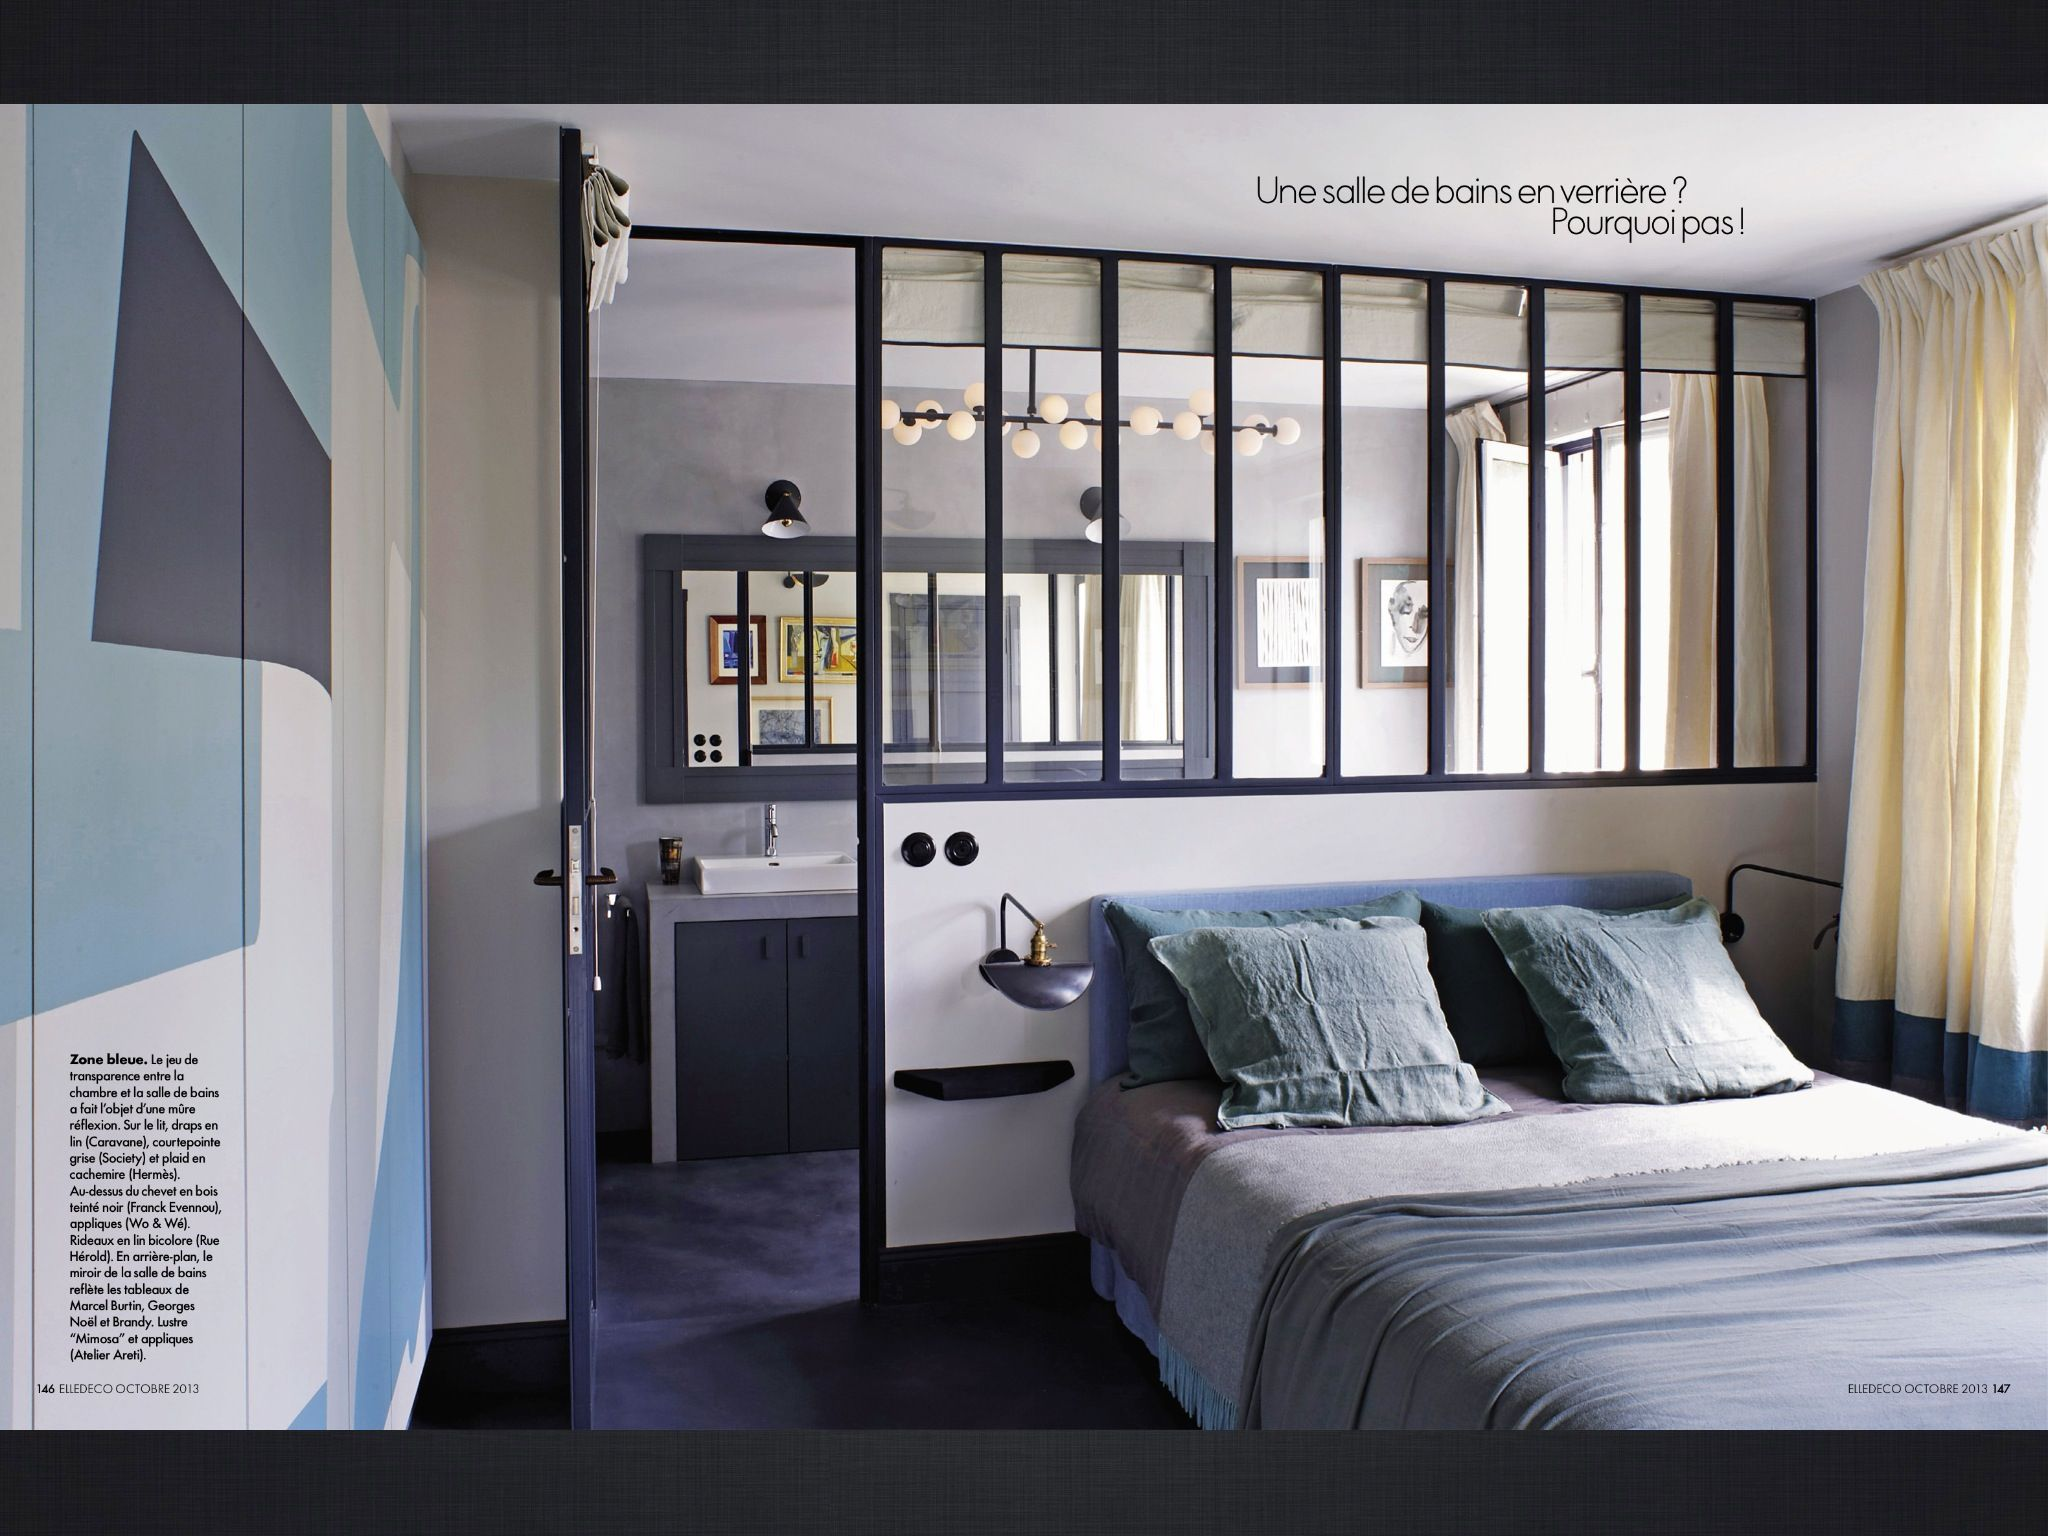 Pin von Raphaelle Levet auf Chambres // Bedrooms | Pinterest ...